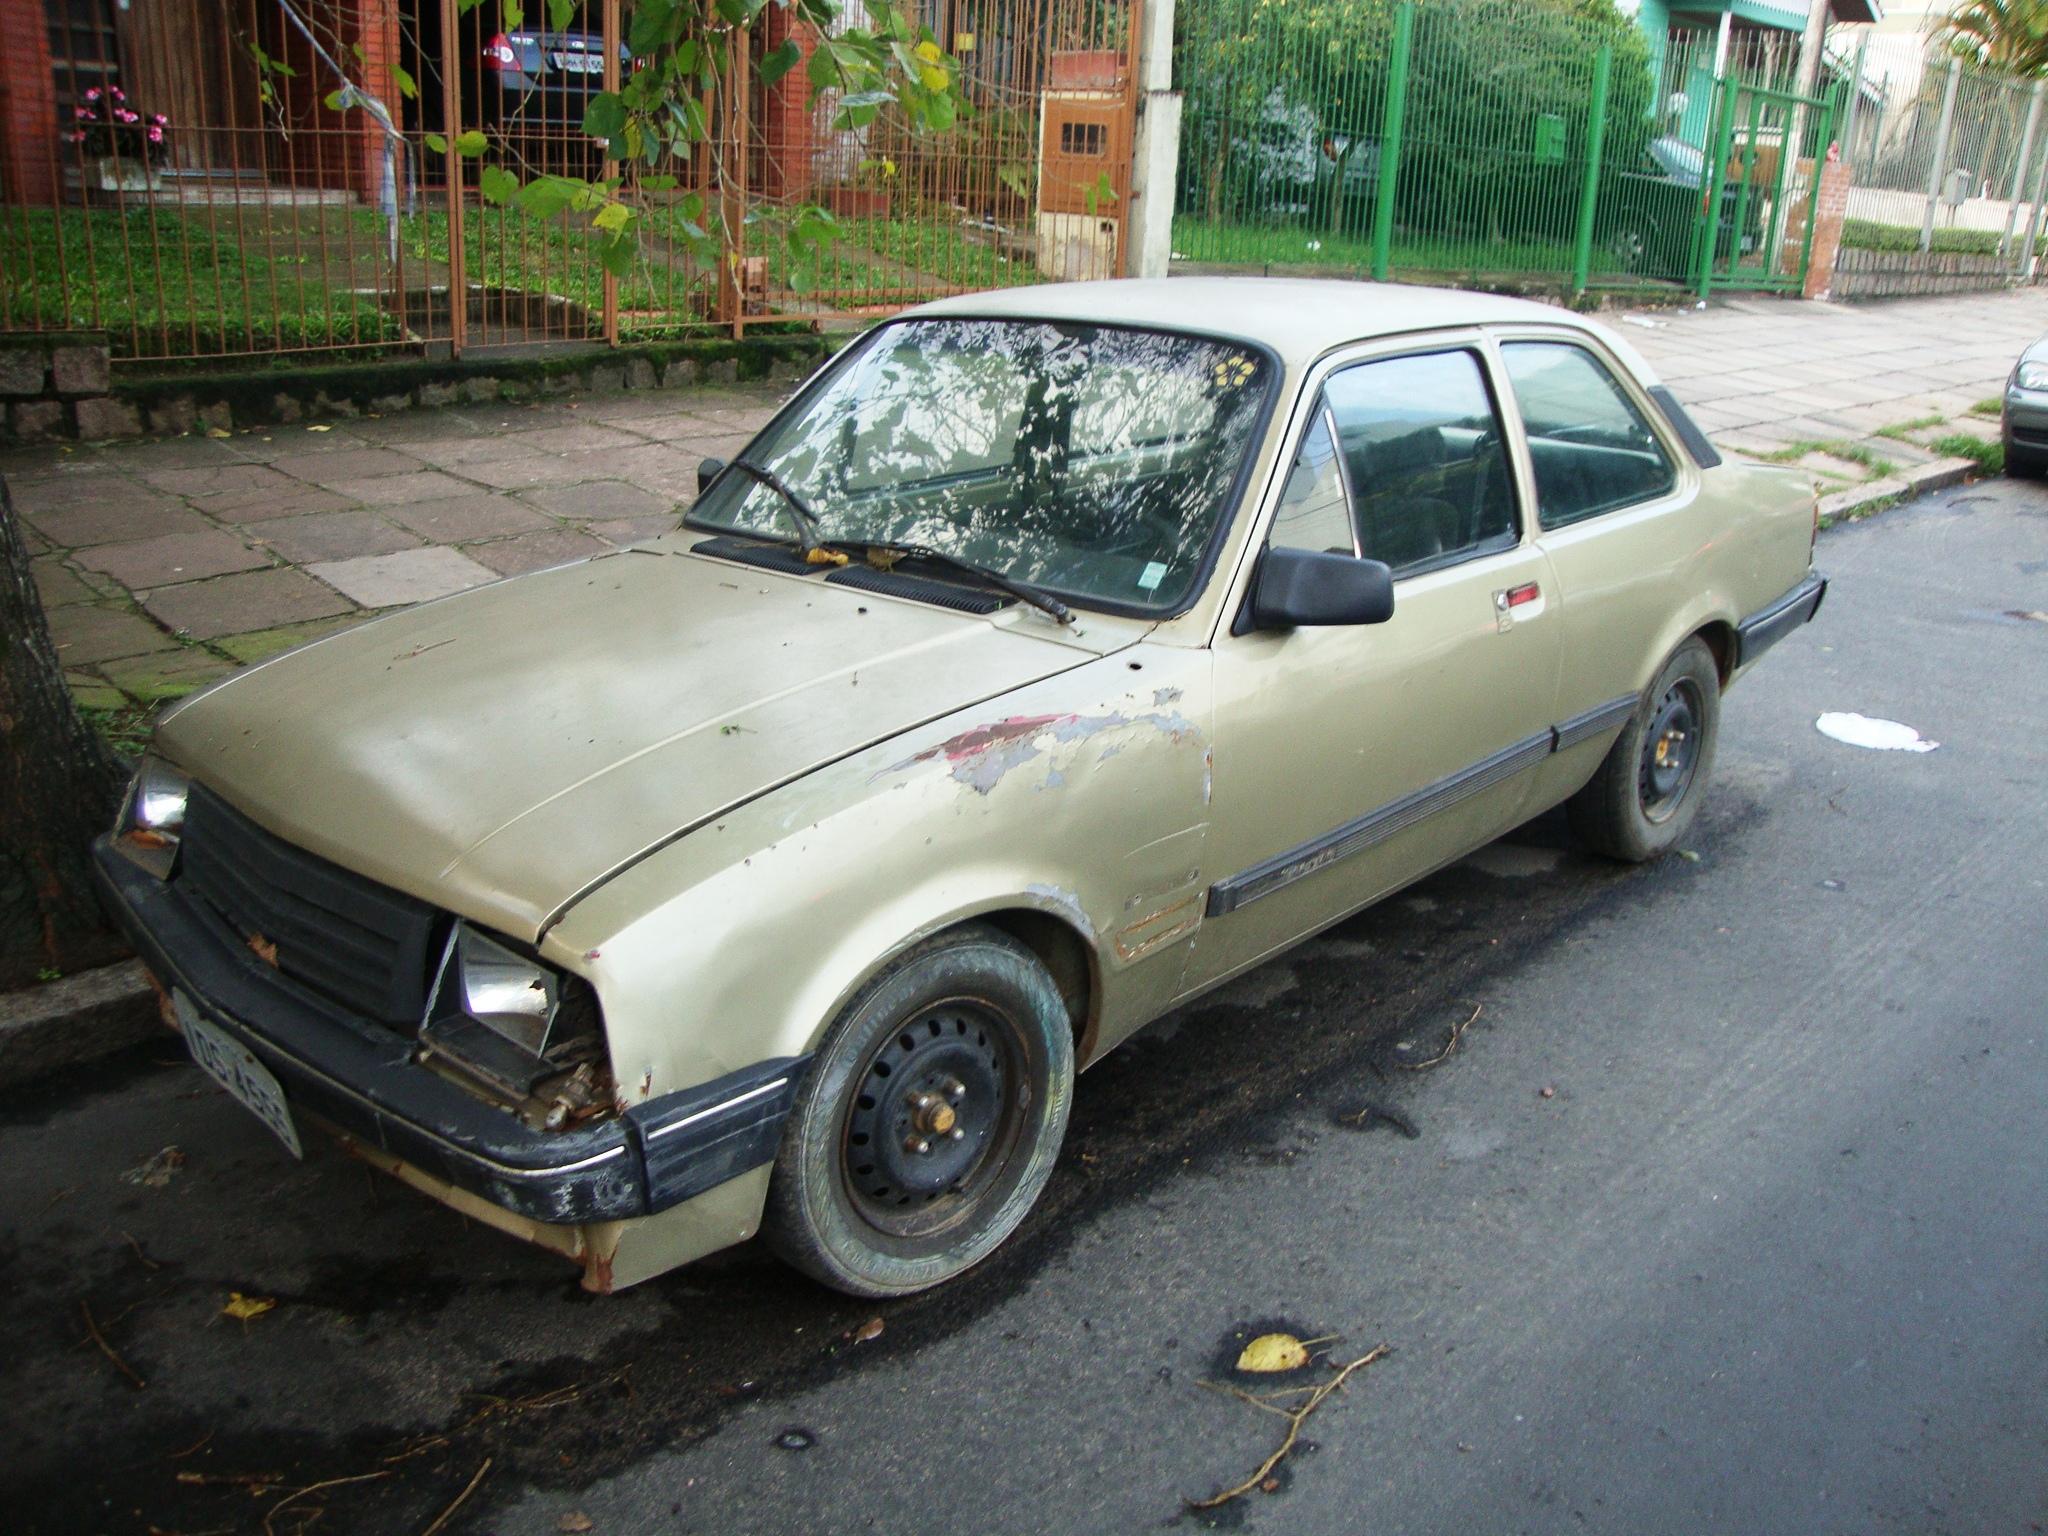 umktpoachevette-3 Chevrolet Chevette